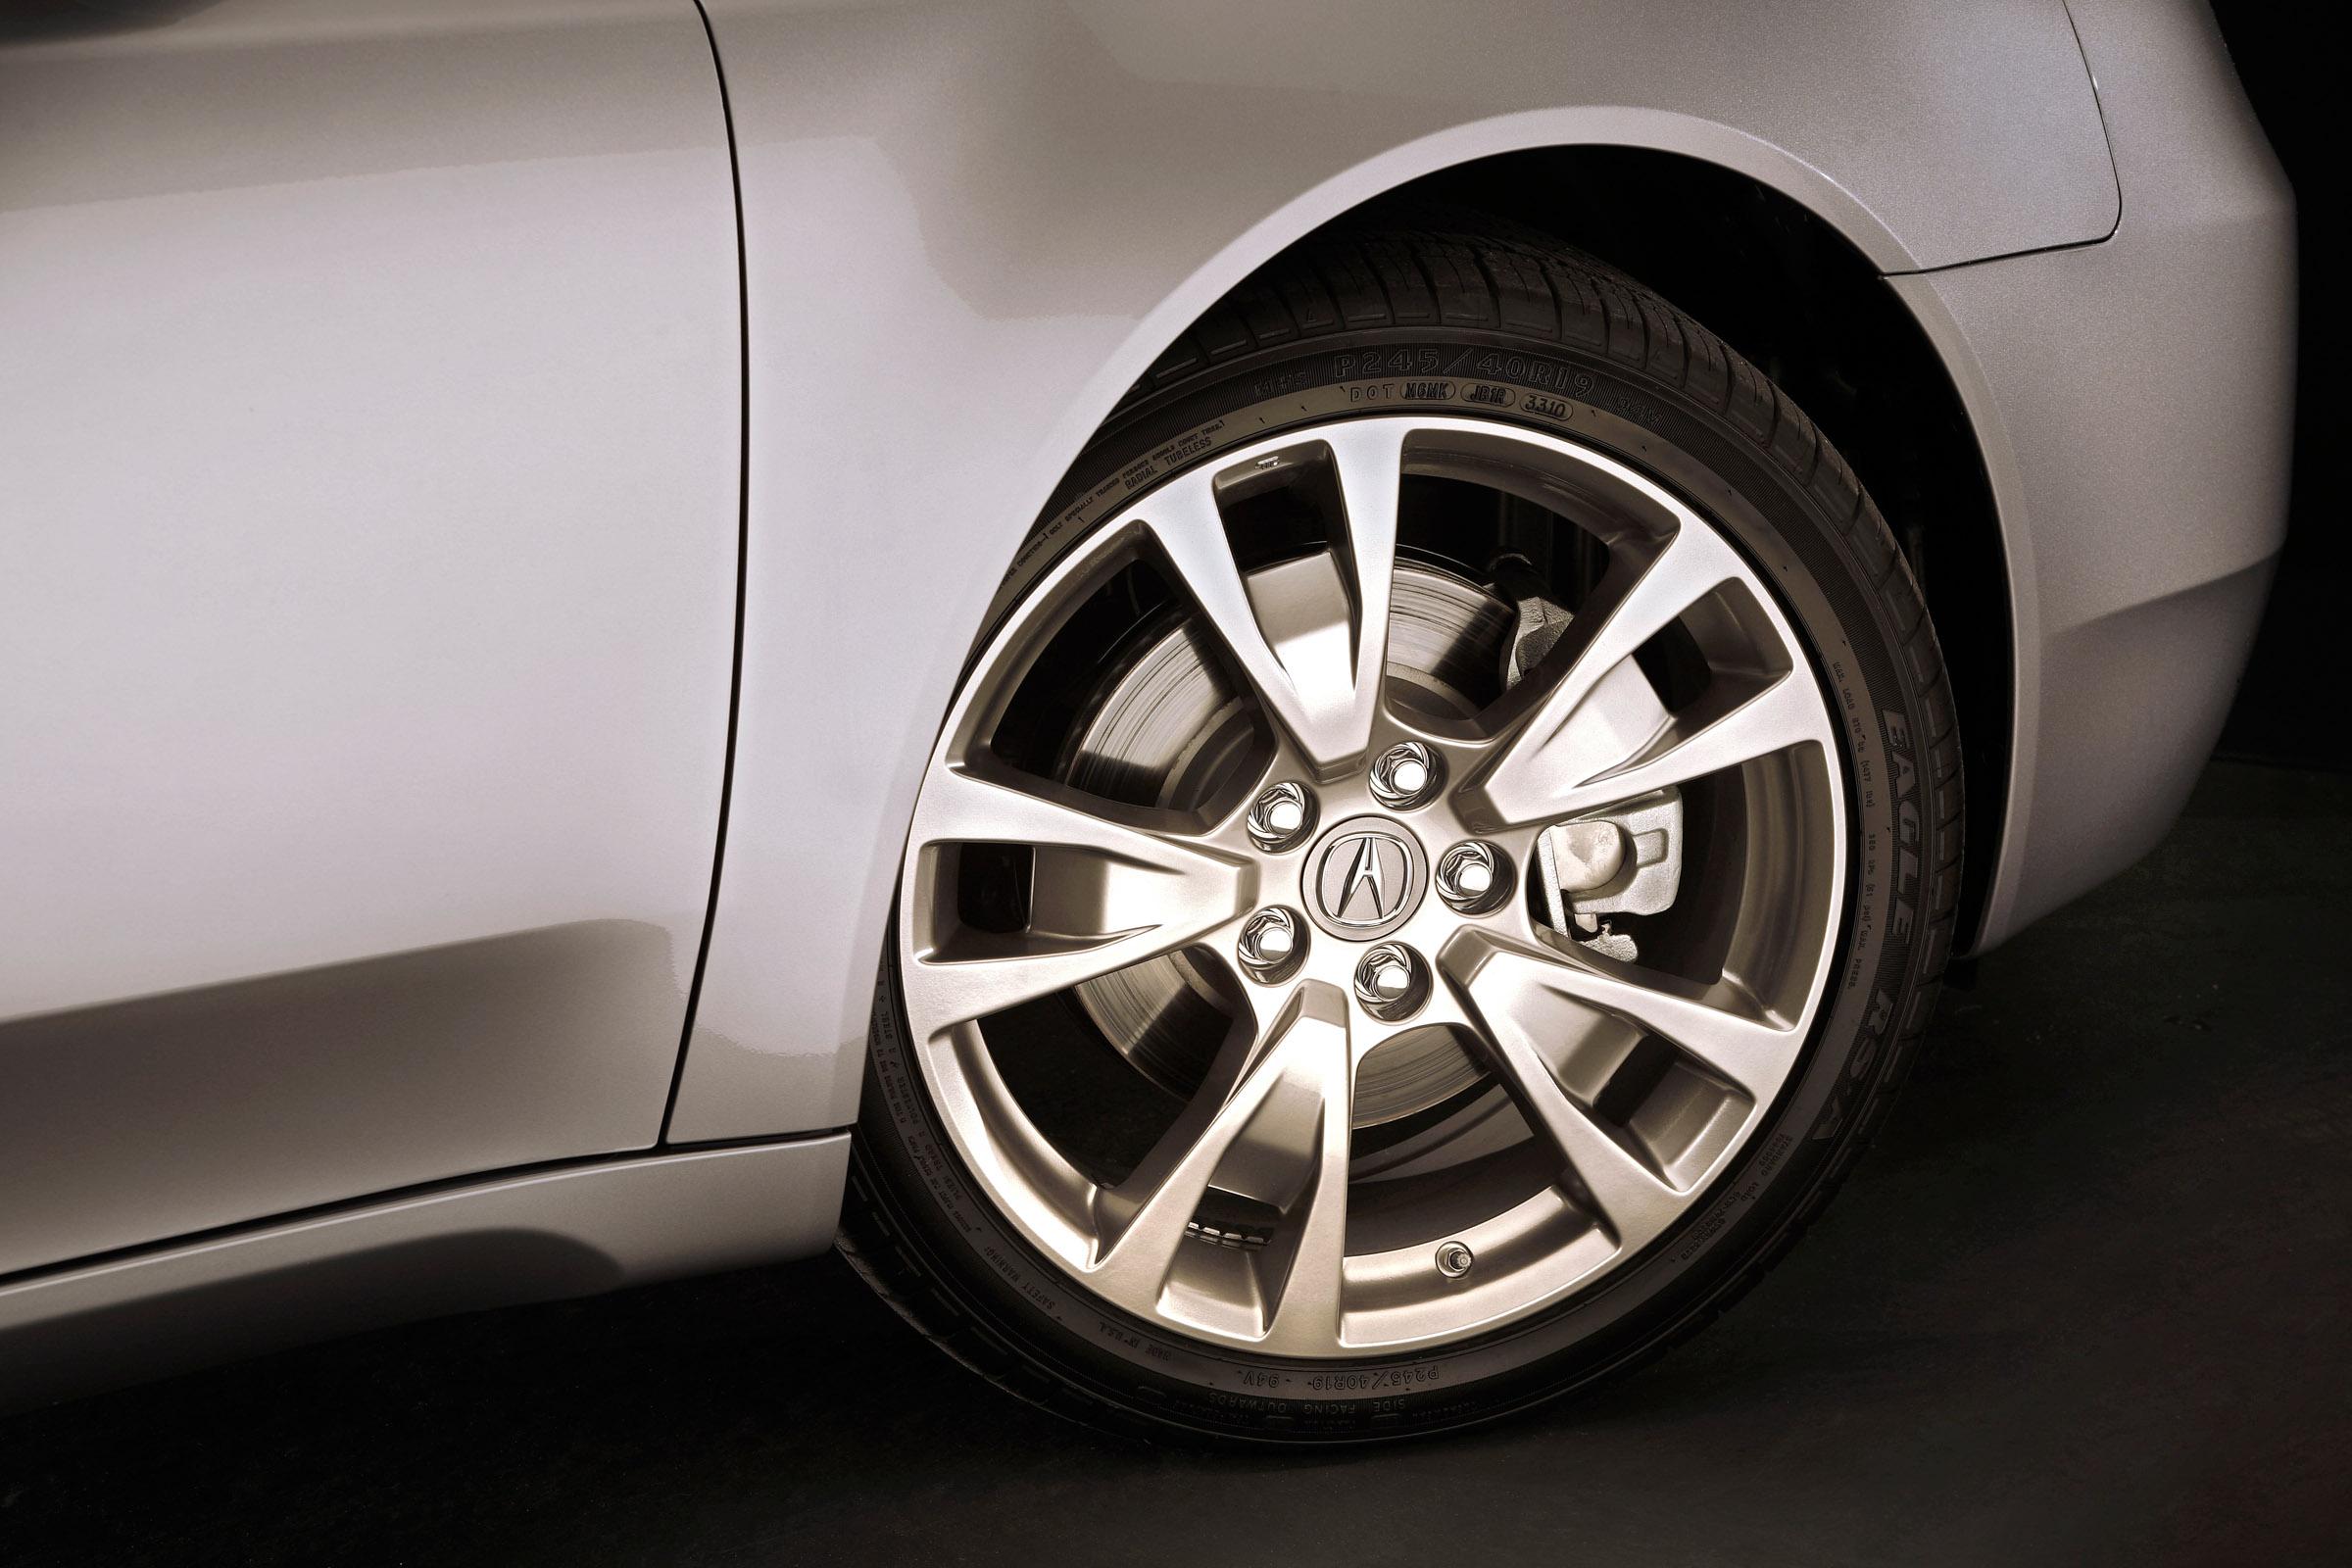 2012 Acura TL в продаже - фотография №5